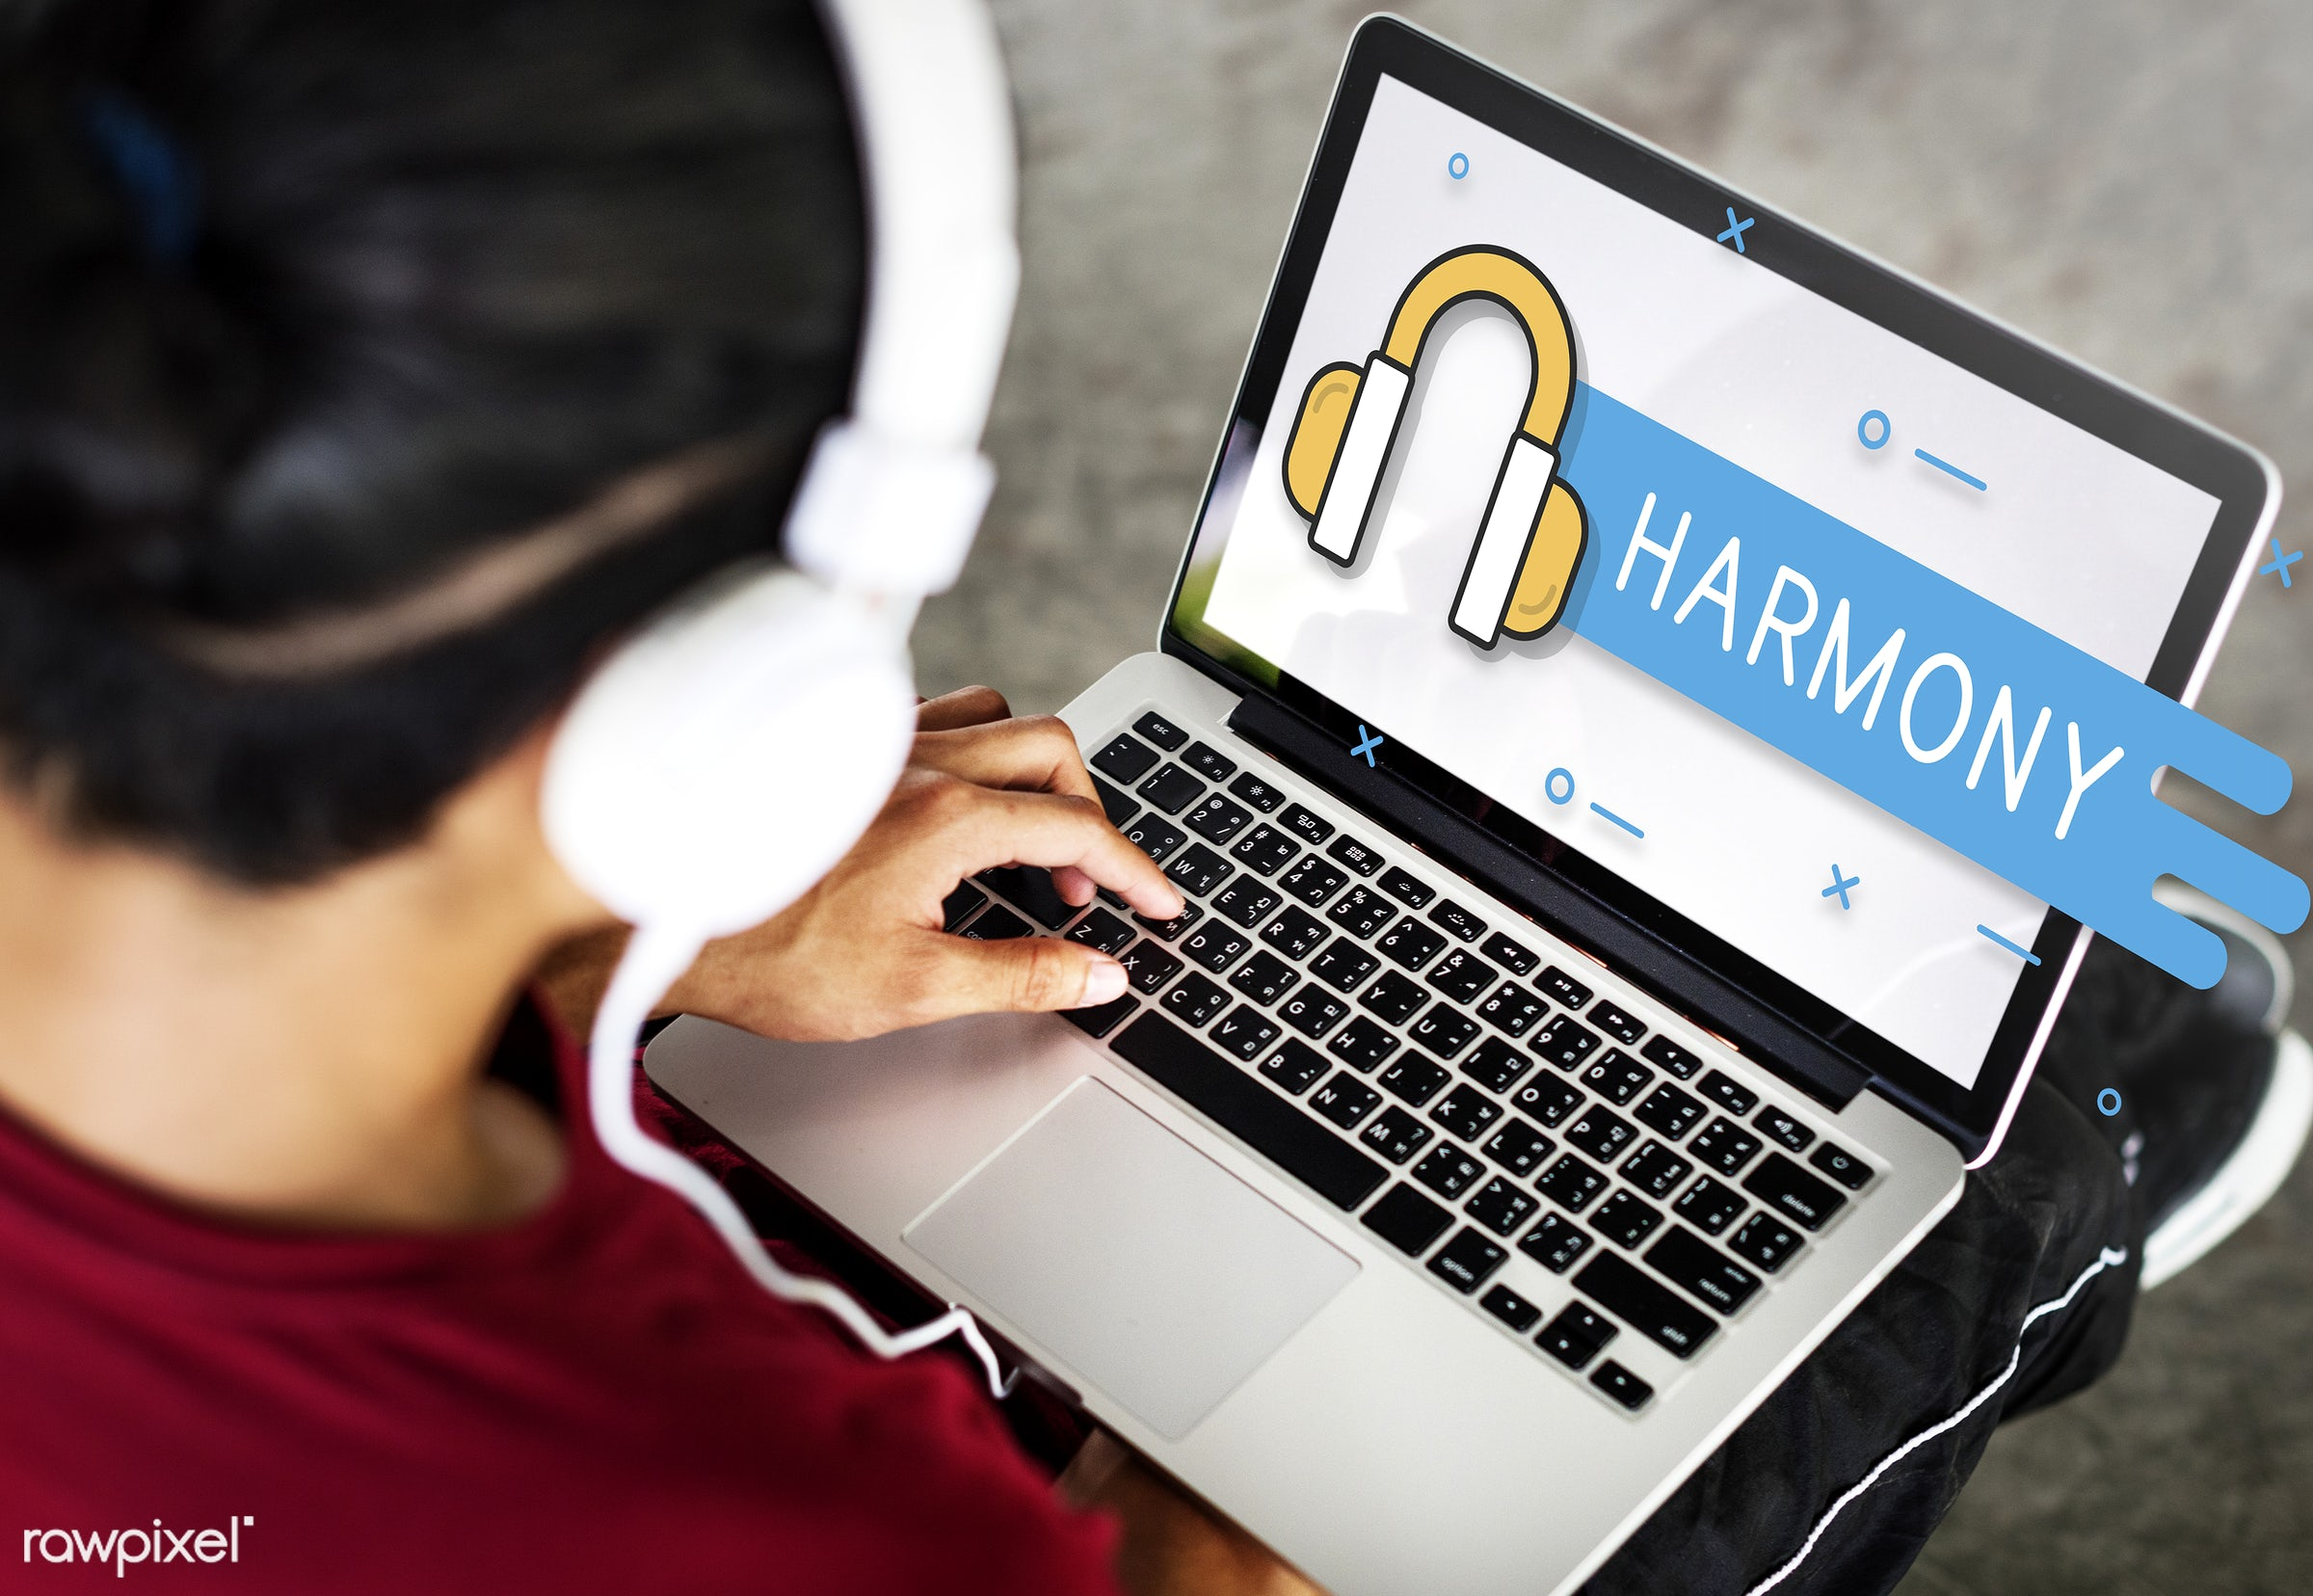 audio, broadcast, browse, browsing, connect, connection, earphones, entertainment, flat, graphics, harmony, headphones, icon...